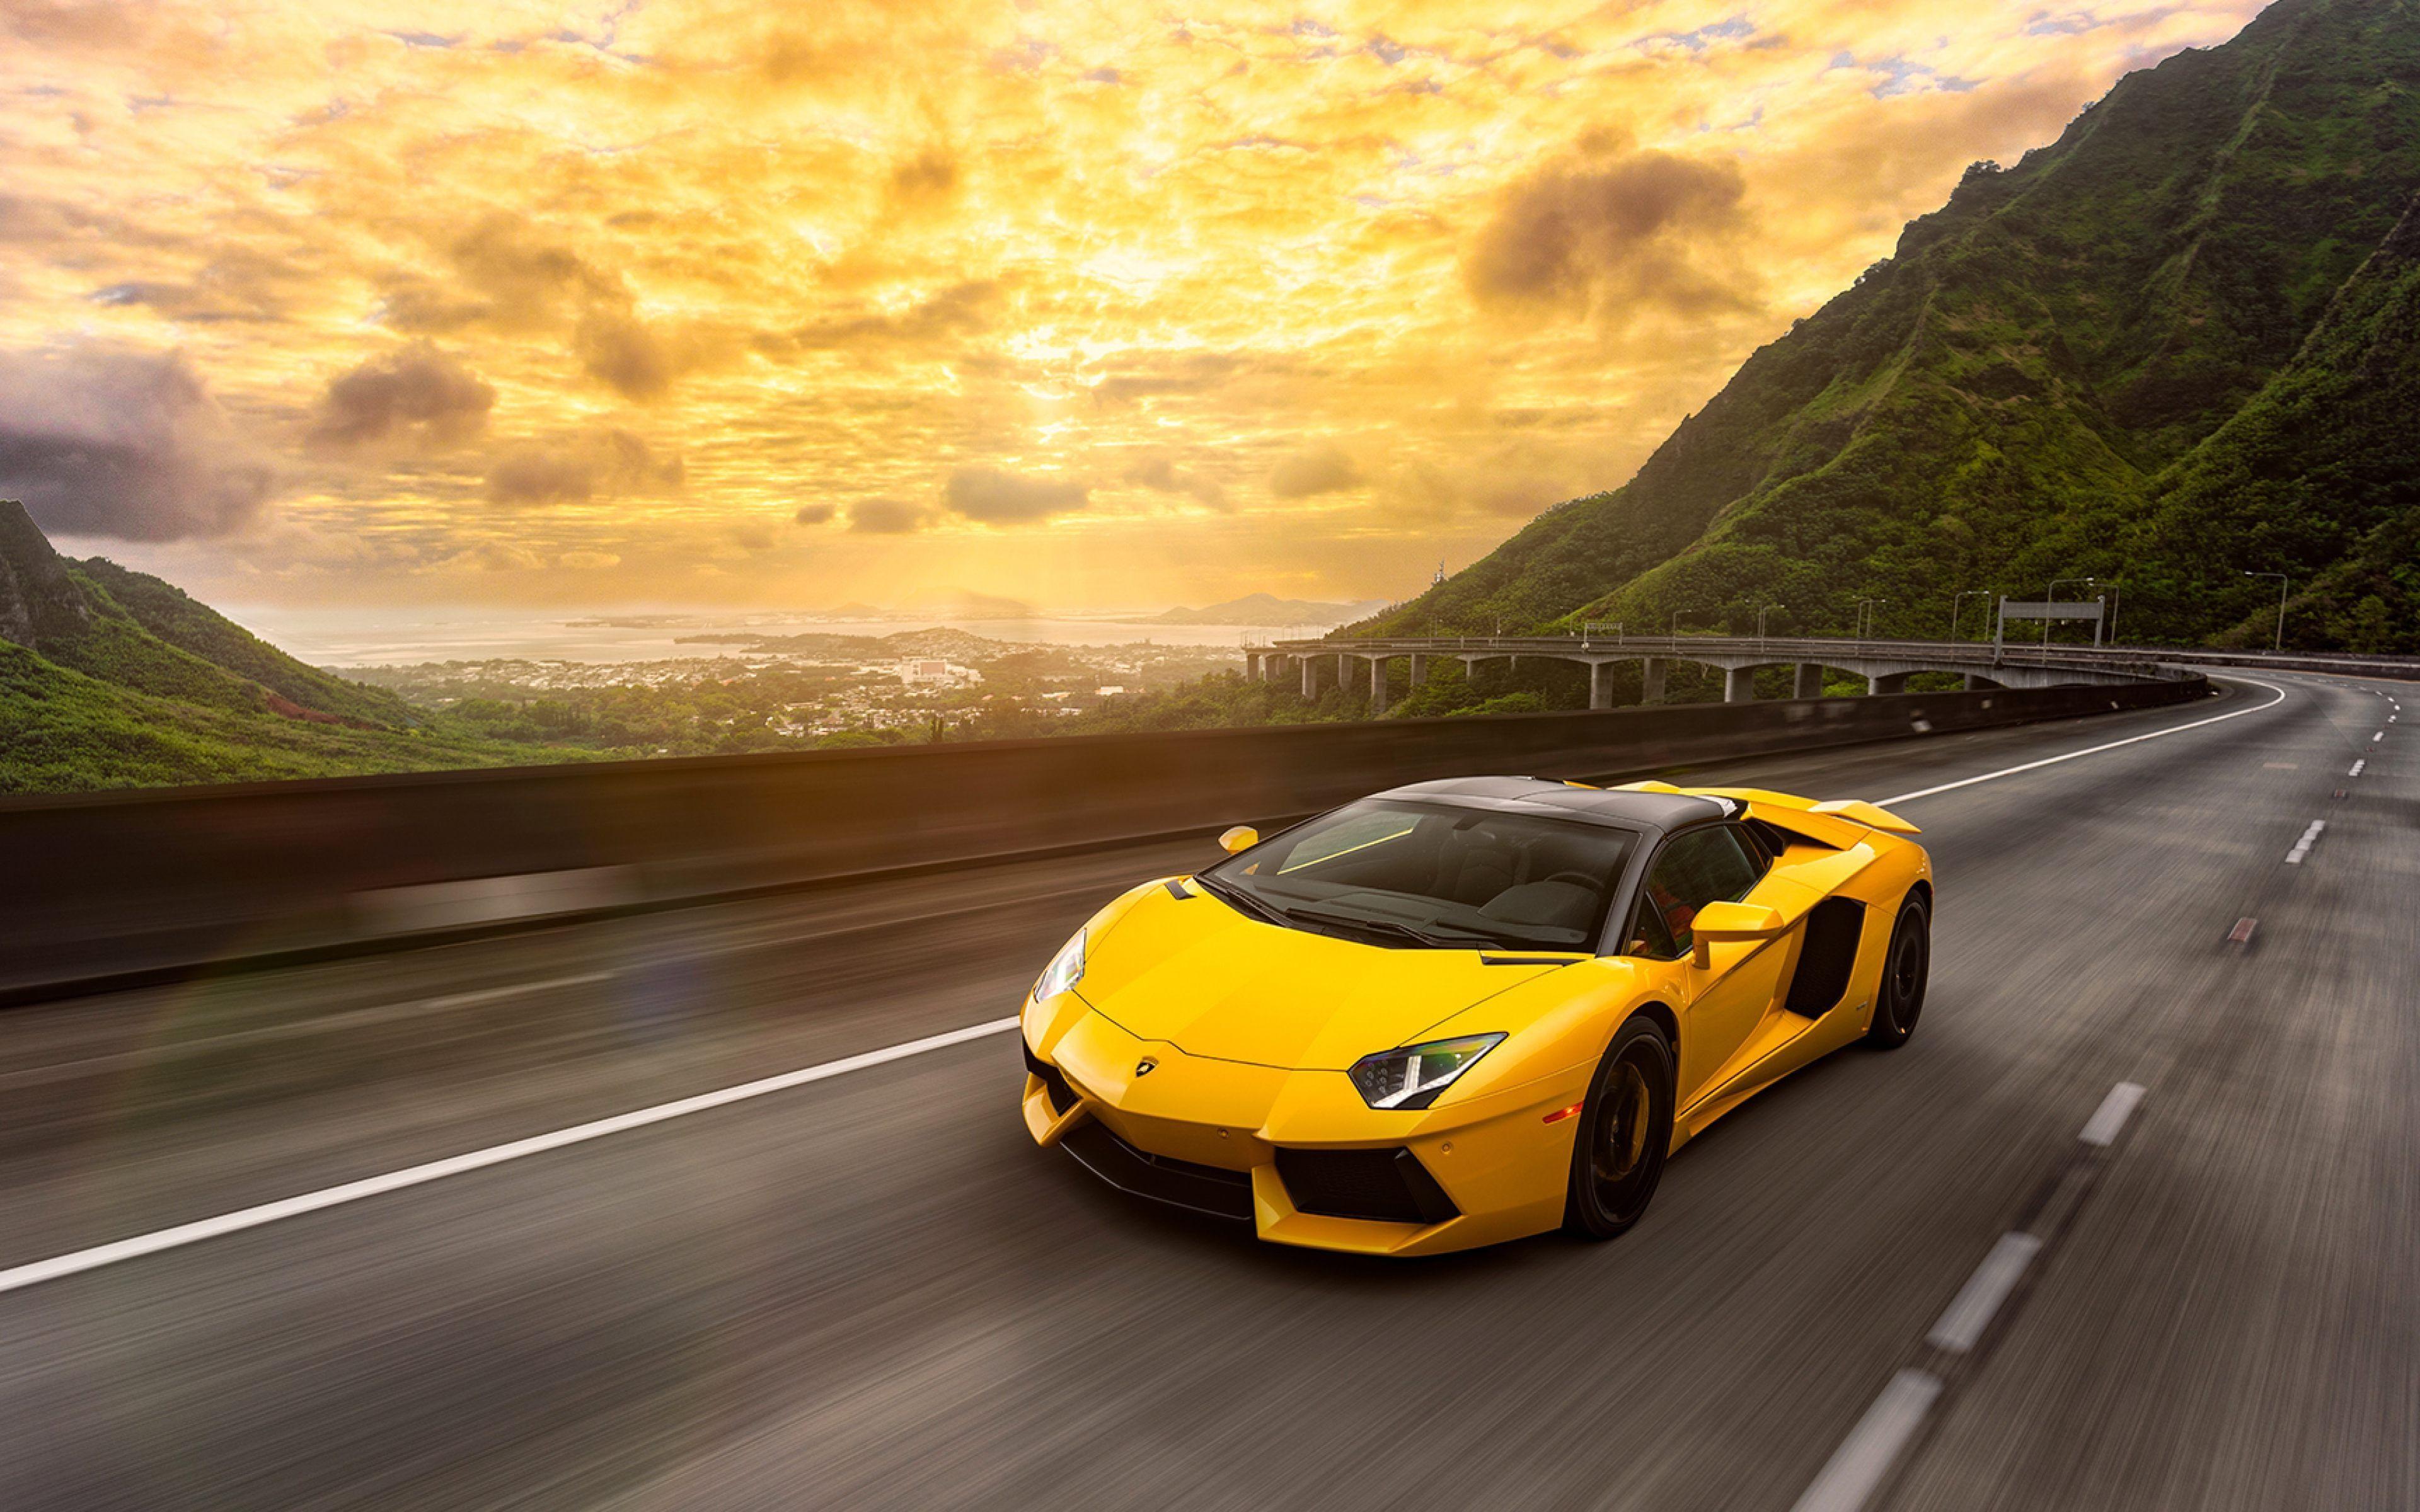 4K Car Wallpapers   Top 4K Car Backgrounds   WallpaperAccess 3840x2400